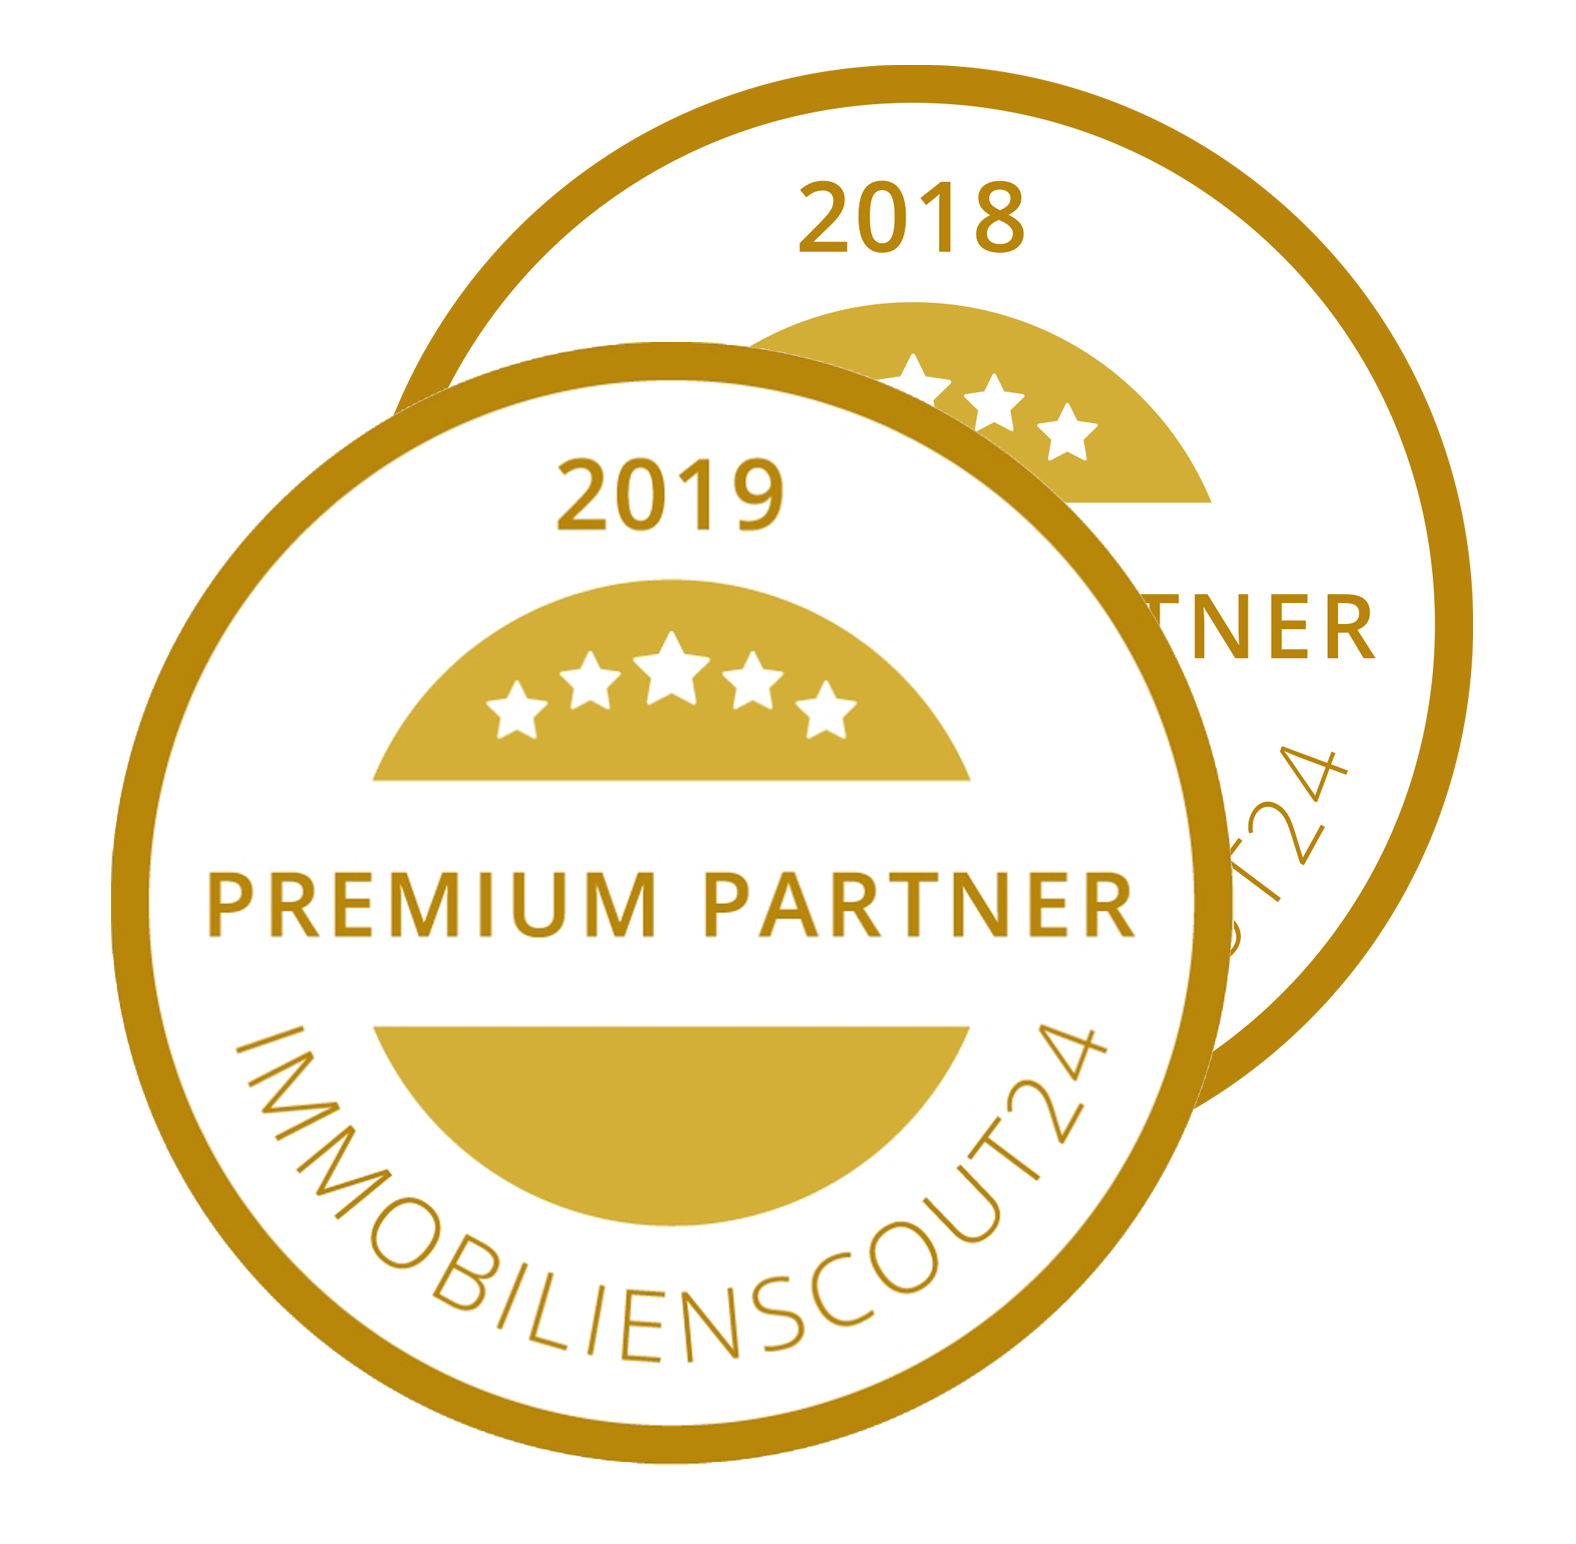 ImmobilienScout24 Premium Partner 2018 2019